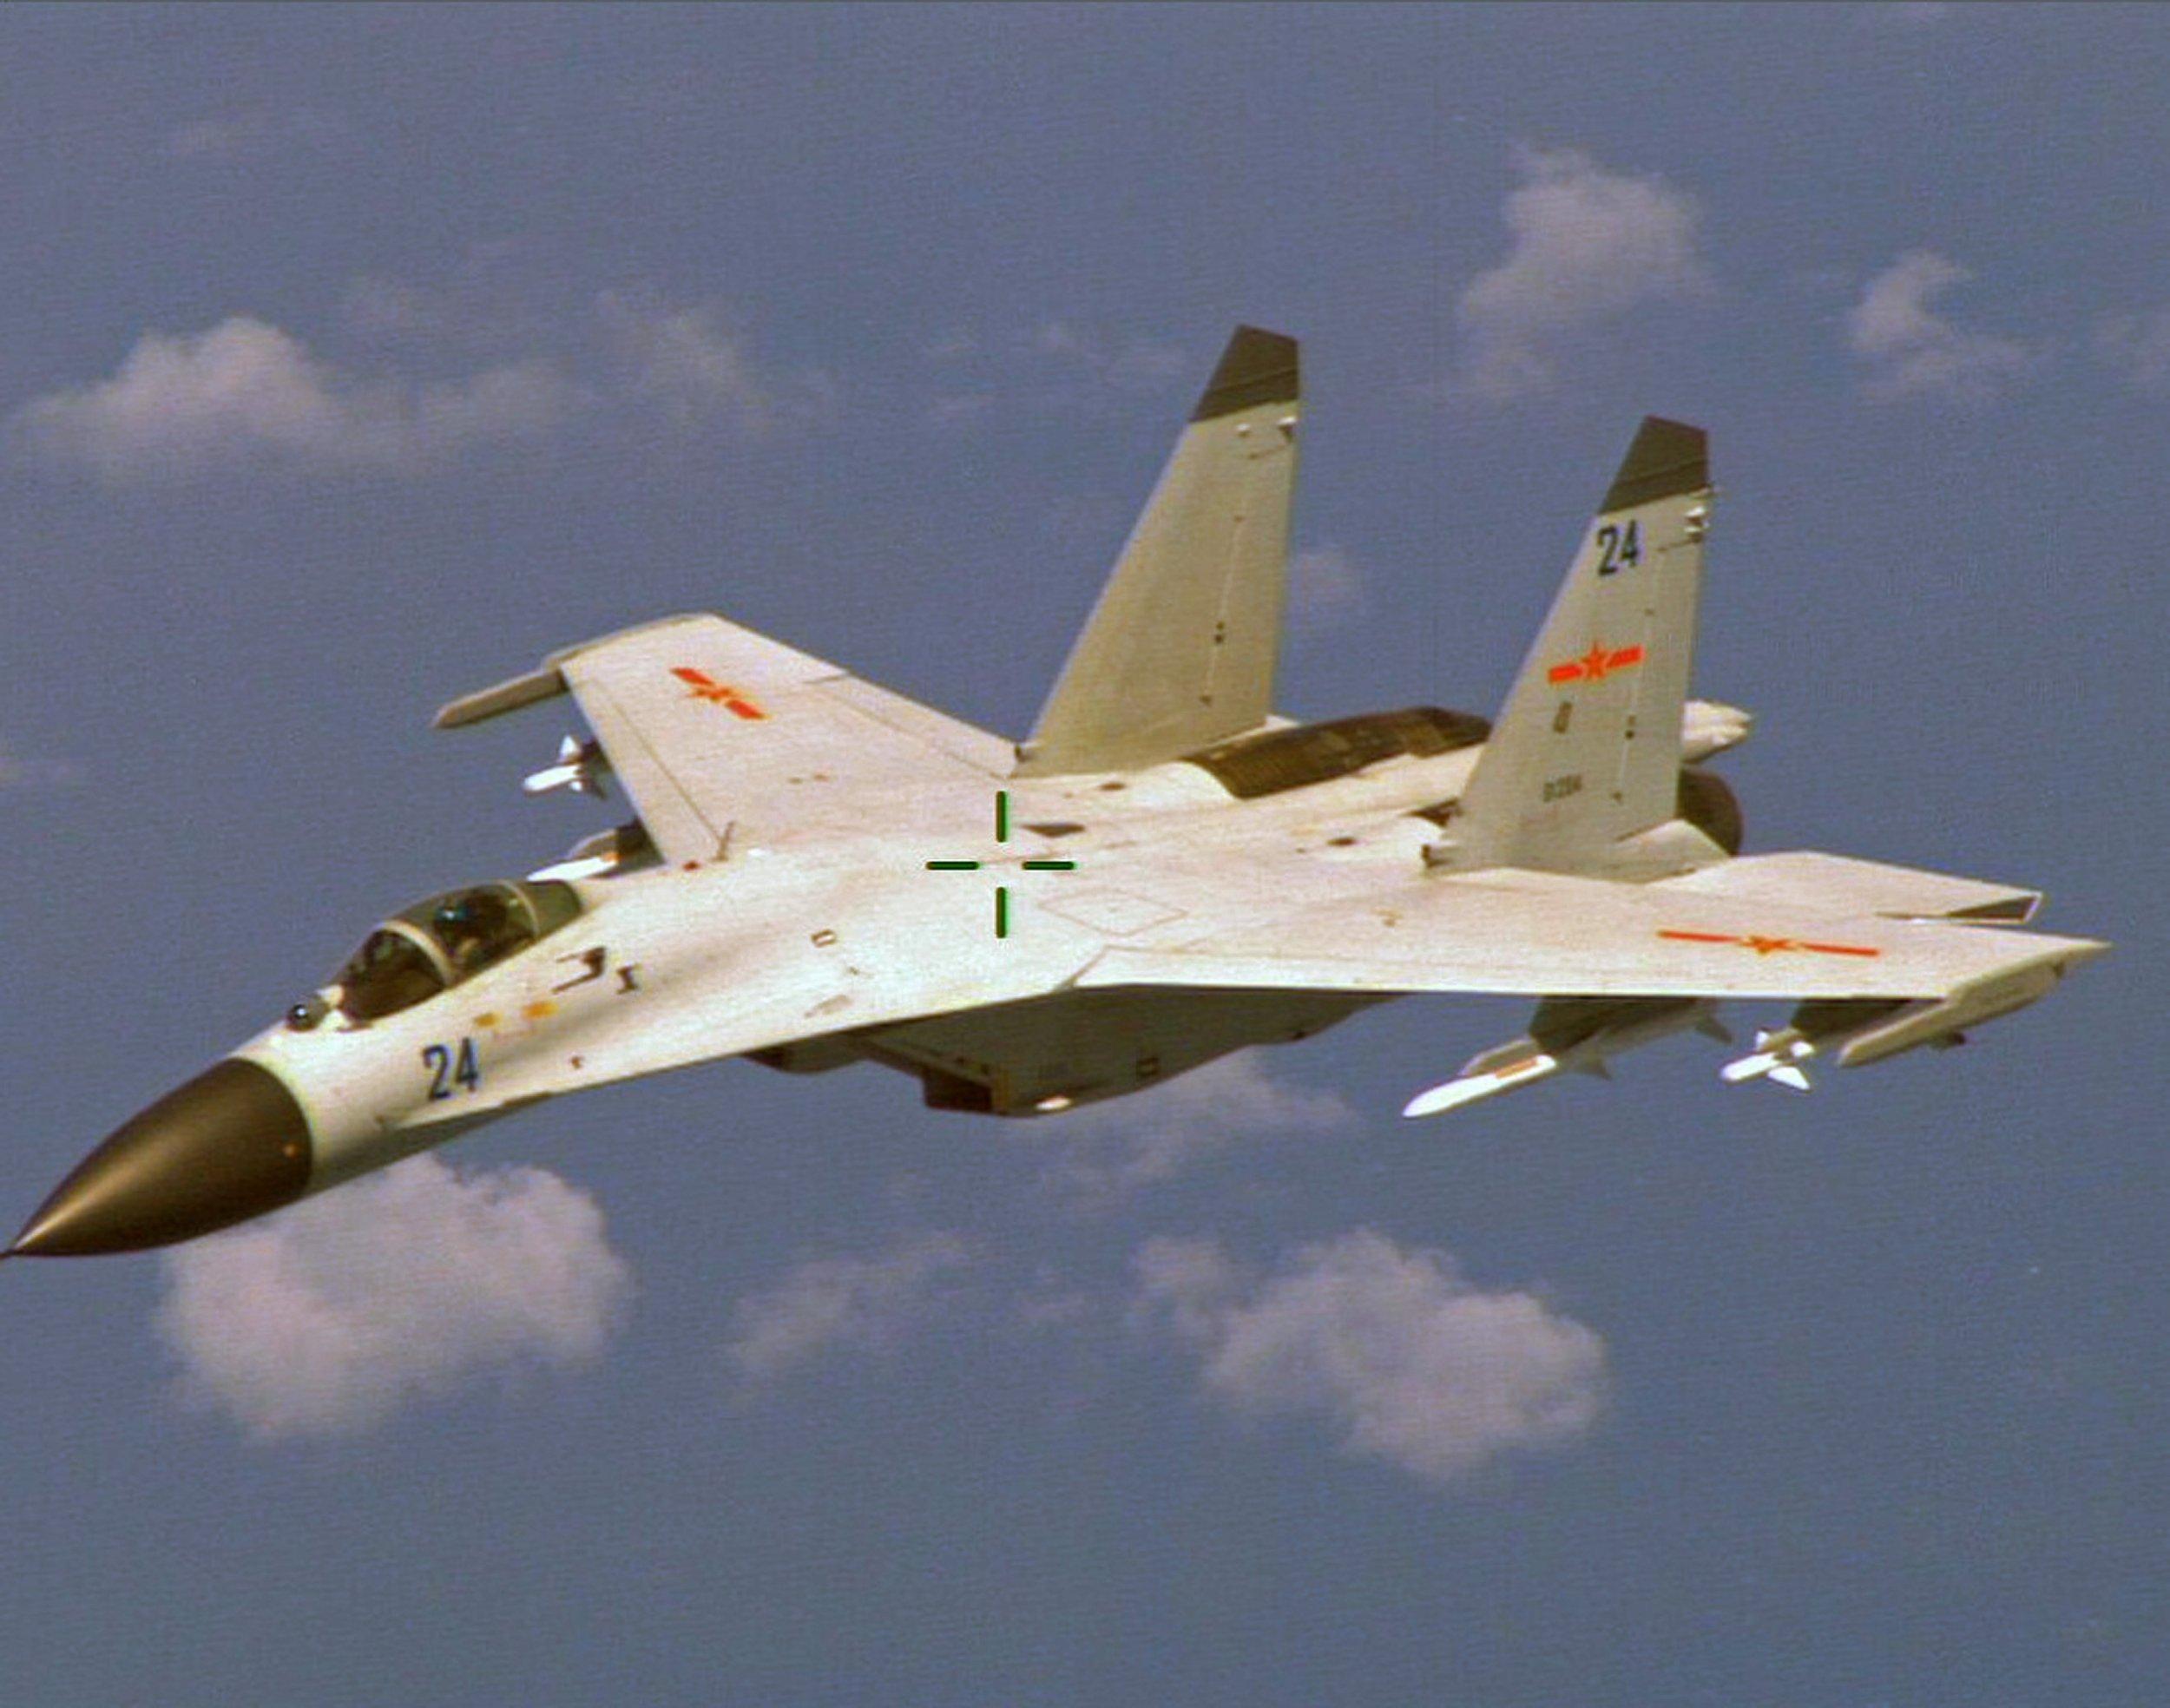 Chinese Warplanes Enter Korea Air Defense Zone, Prompting South